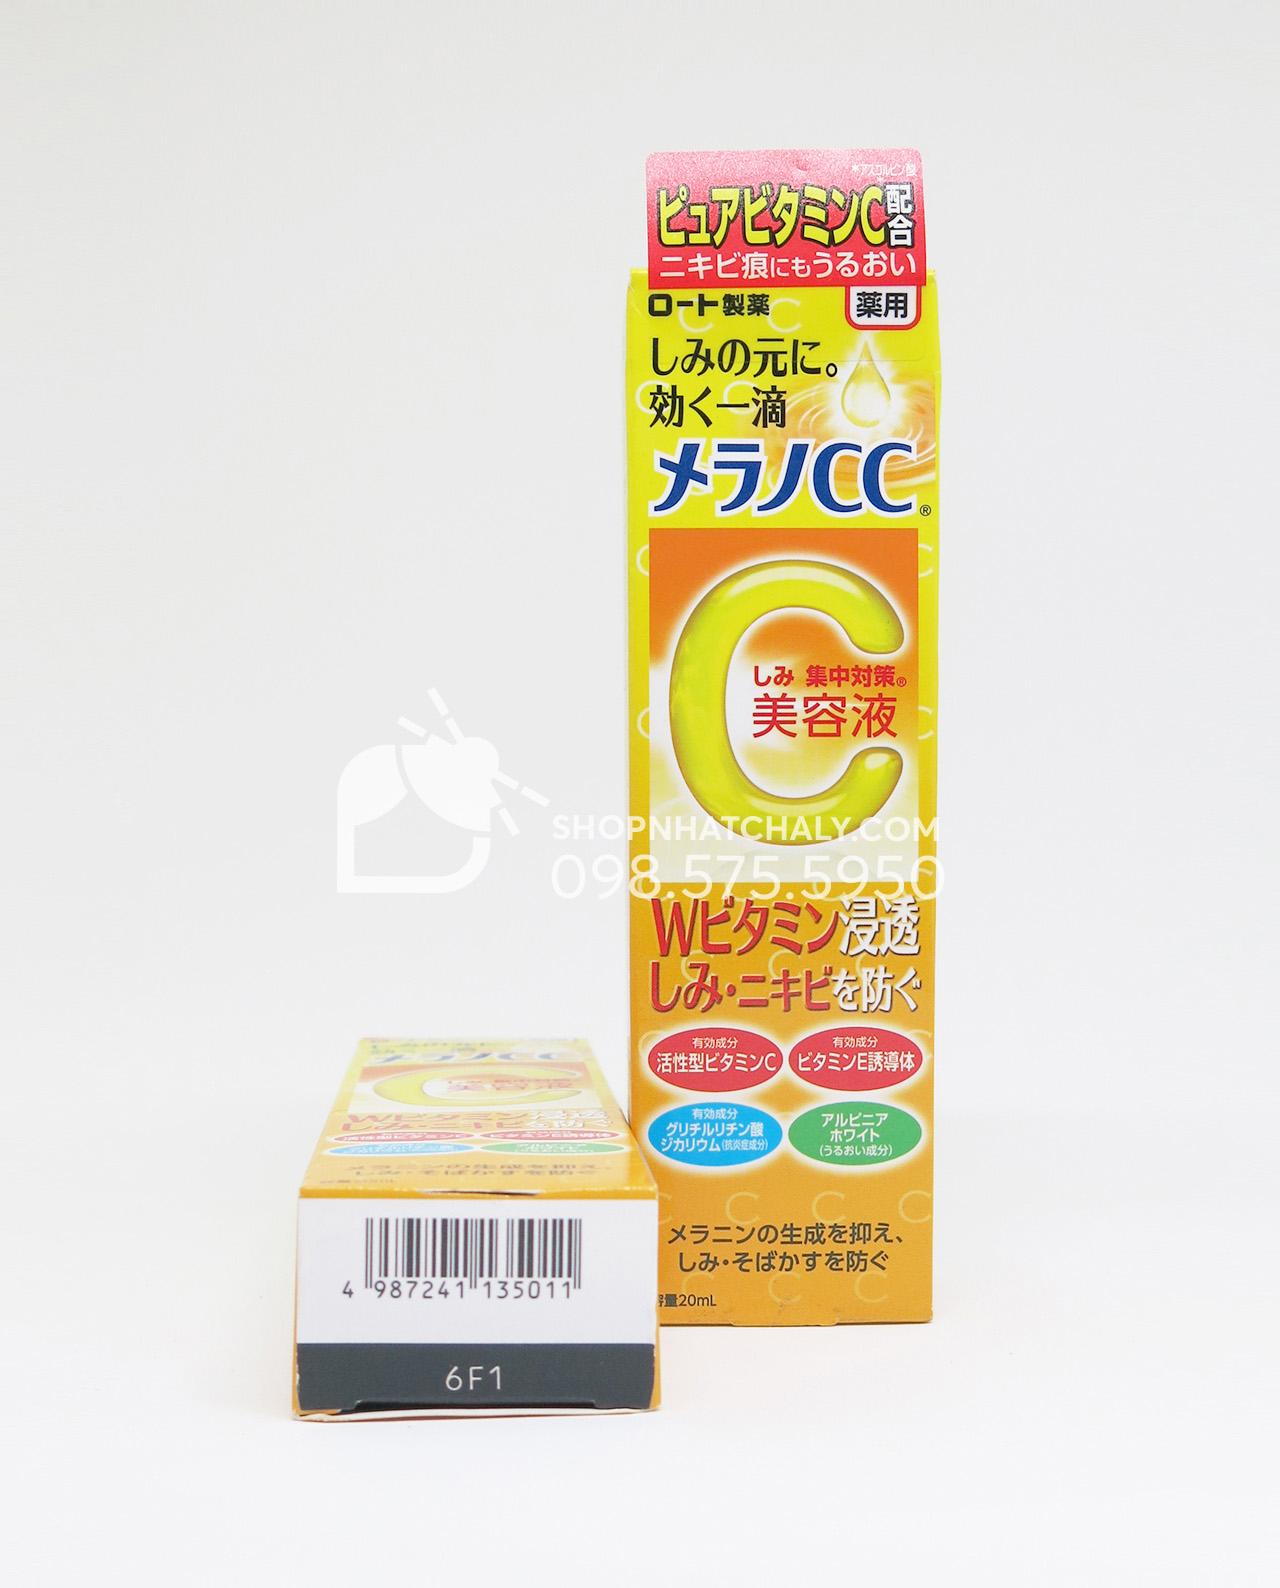 Serum Melano CC Vitamin C Rohto Nhật Bản 20ml - Barcode